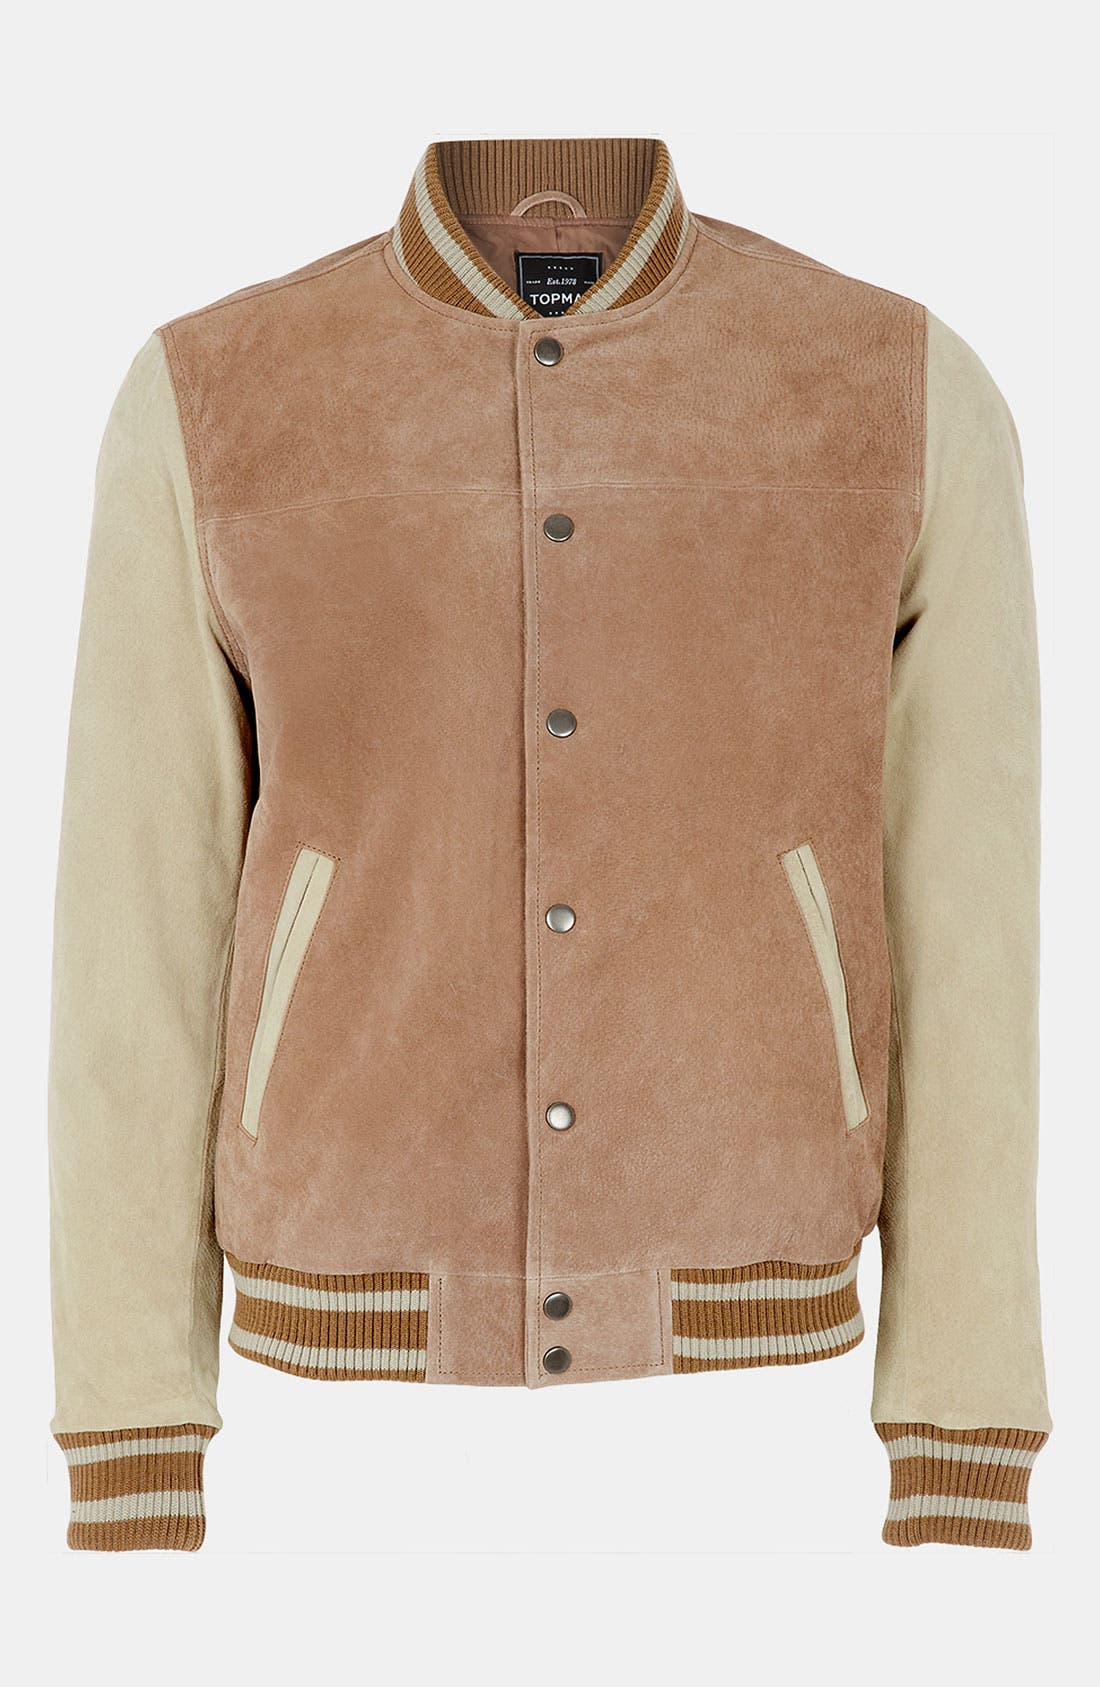 Alternate Image 1 Selected - Topman 'Yale' Varsity Jacket